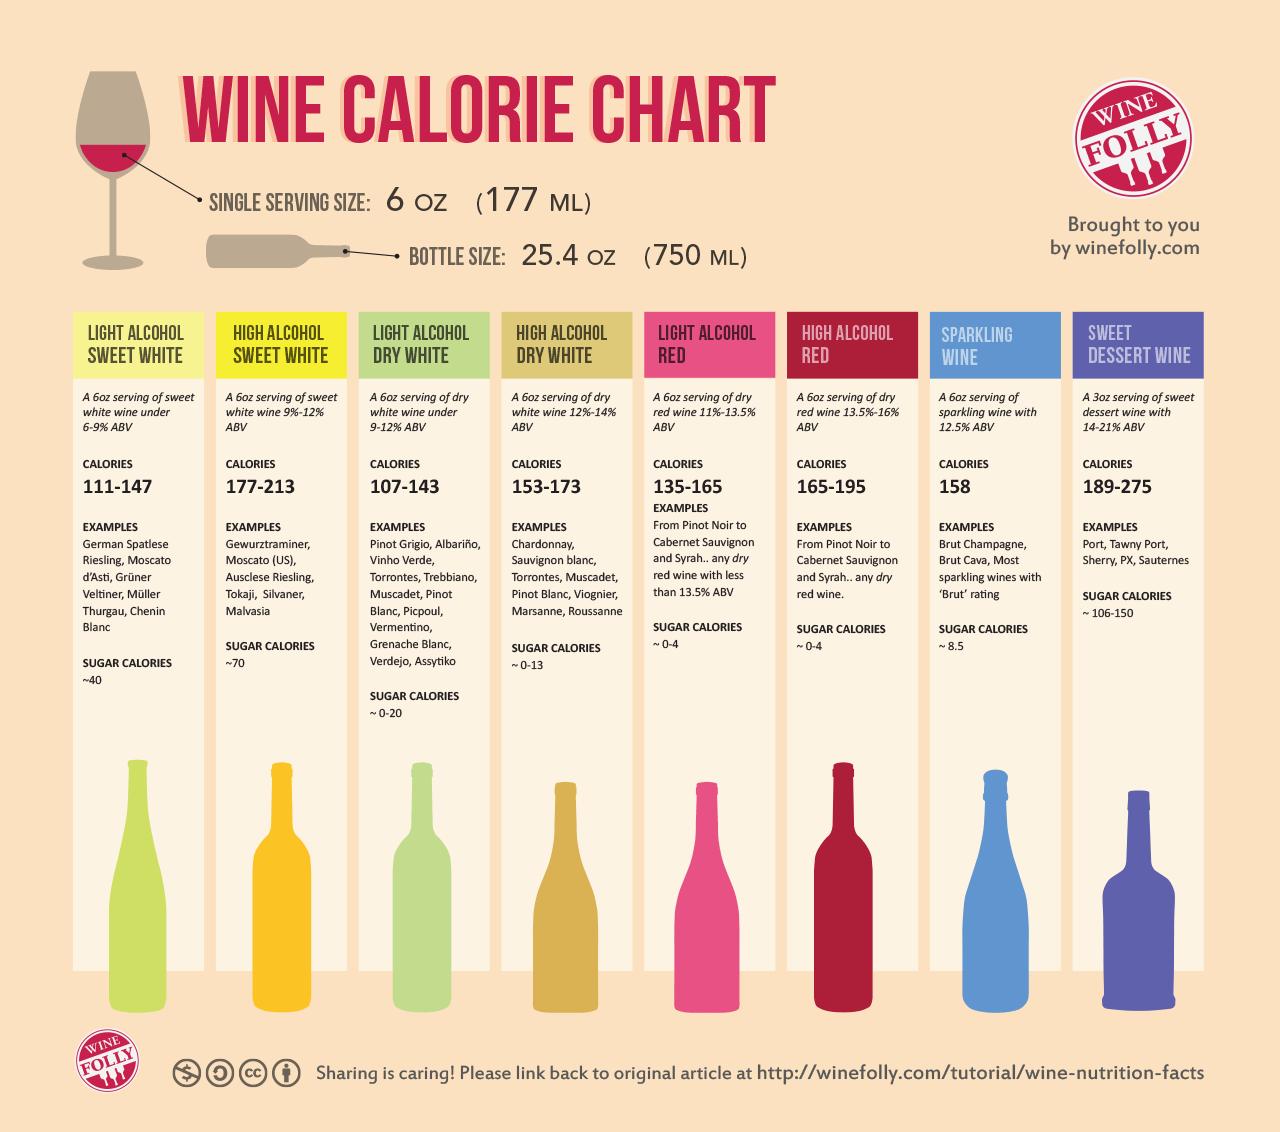 Wine Calorie Chart